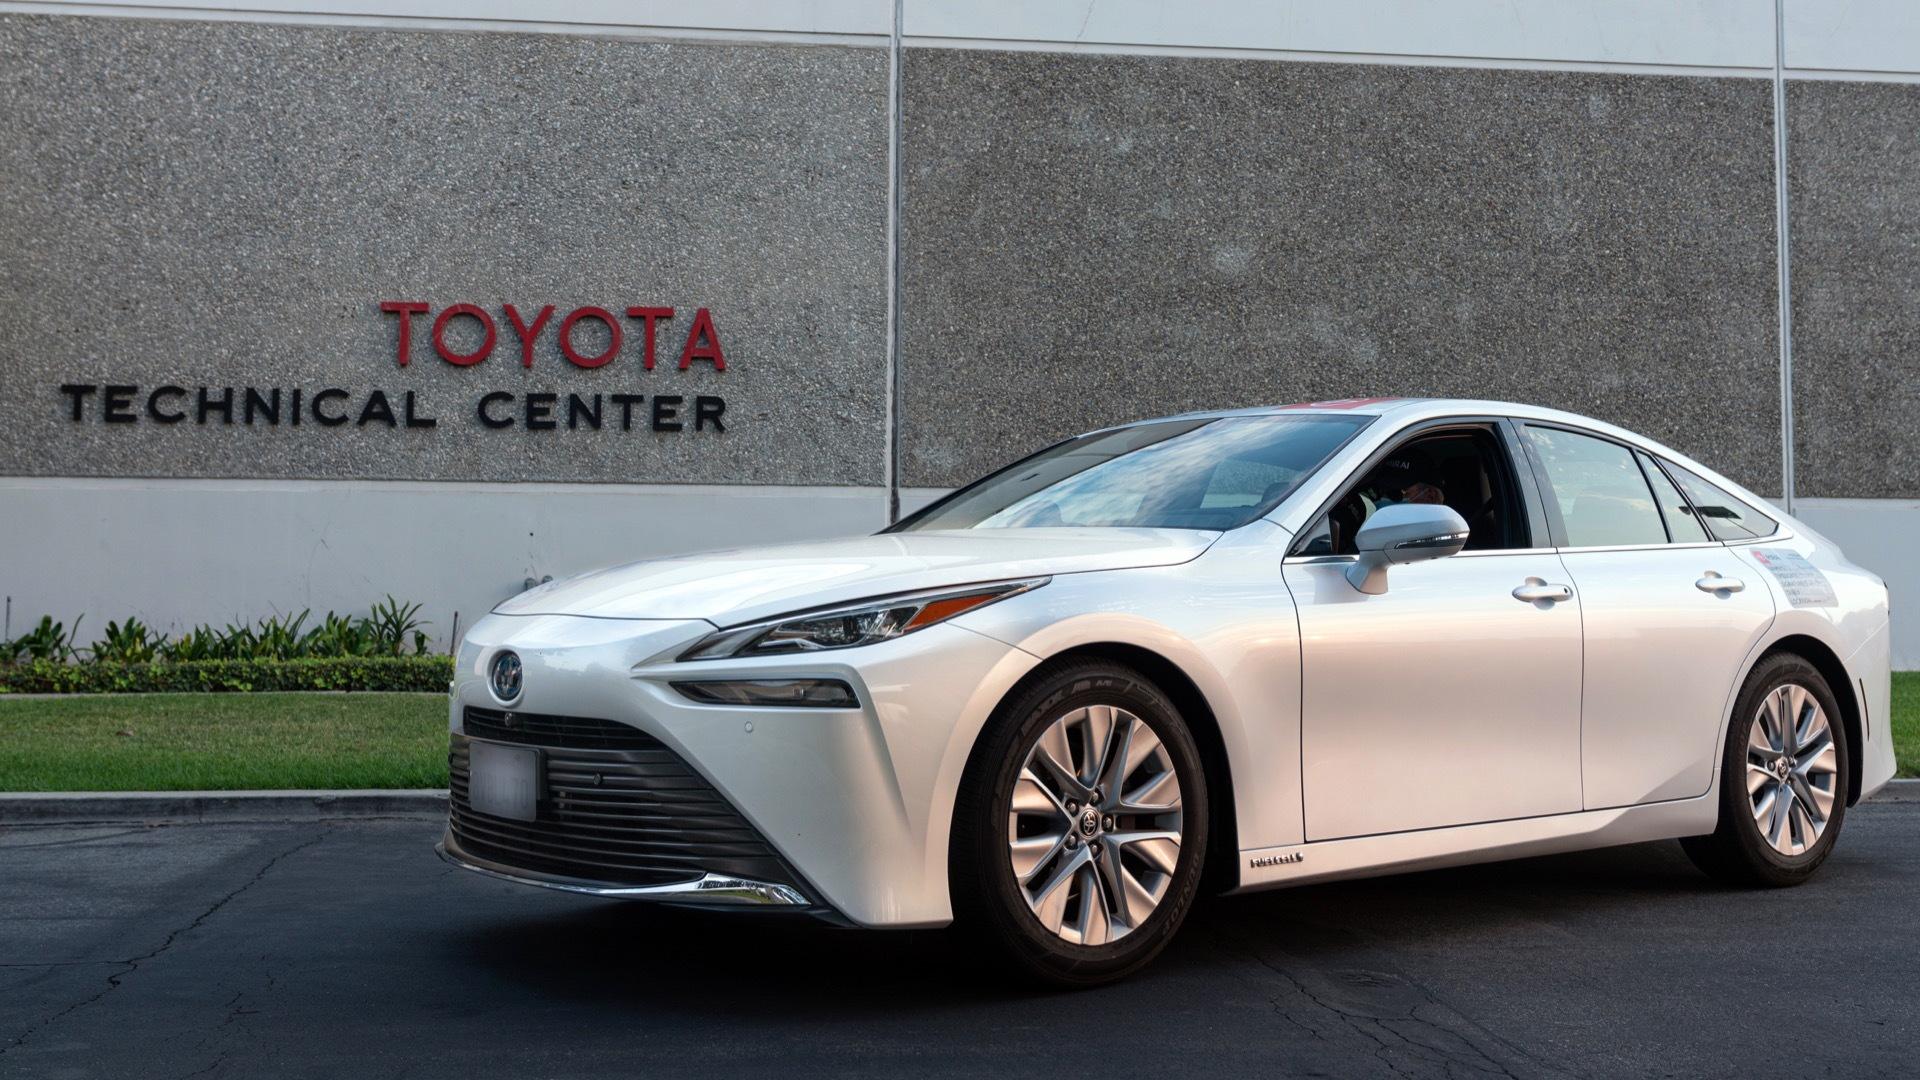 2021 Toyota Mirai Guinness World Record driving distance attempt